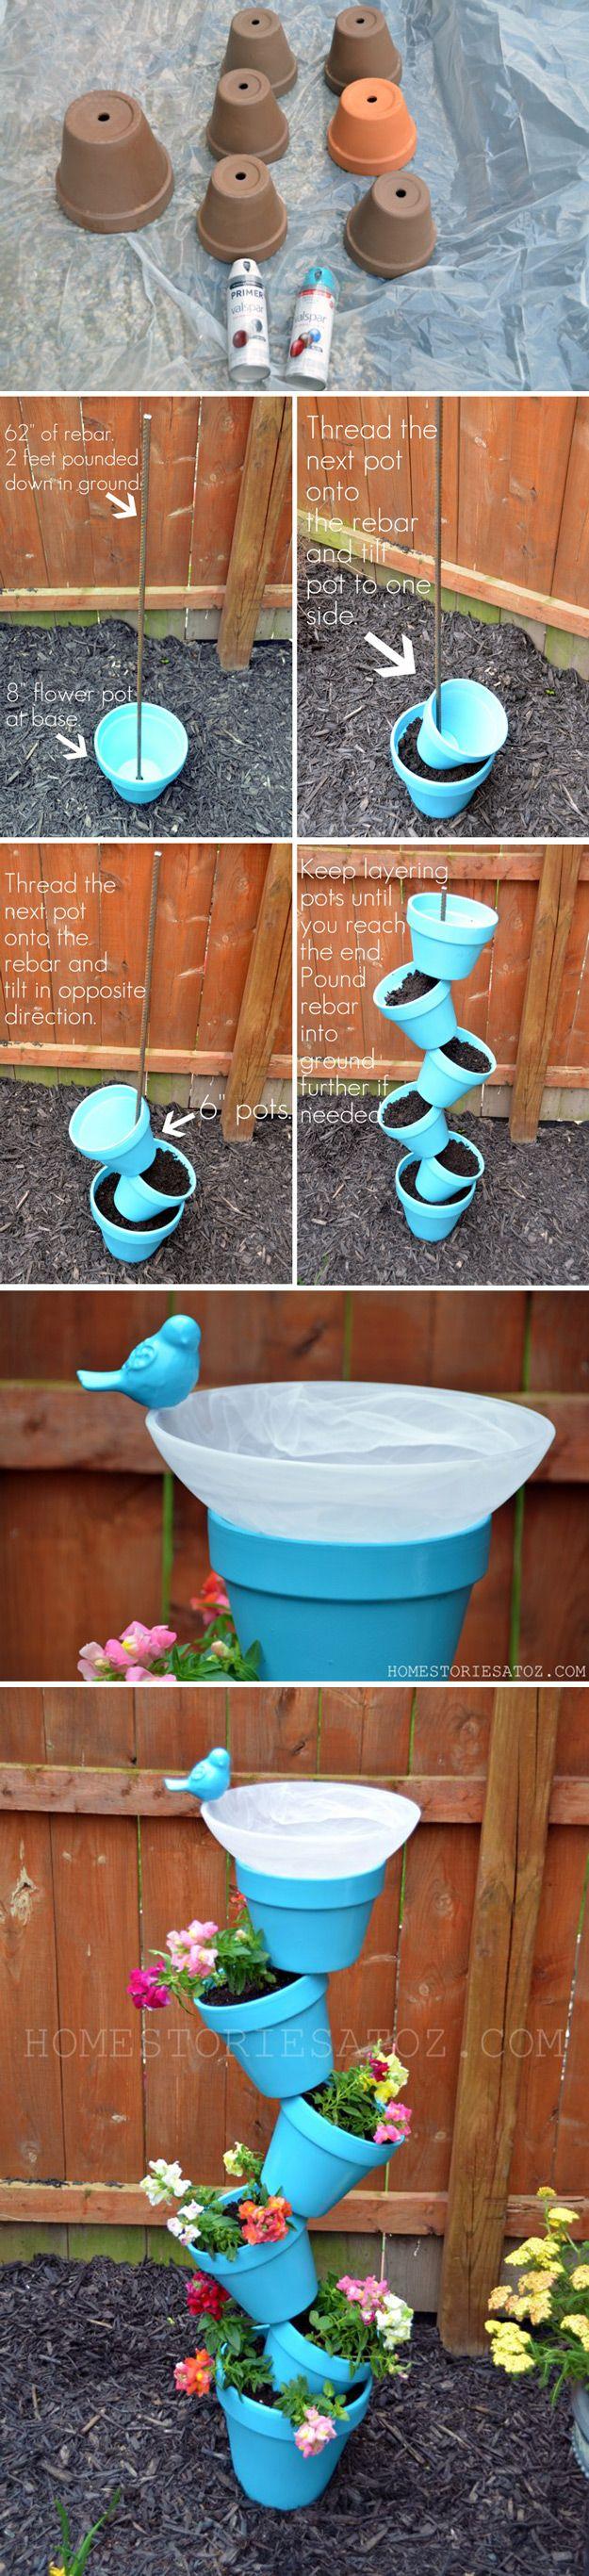 DIY Planter and Bird Bath   Easy Backyard Project for Plants by DIY Ready at http://diyready.com/easy-backyard-projects/